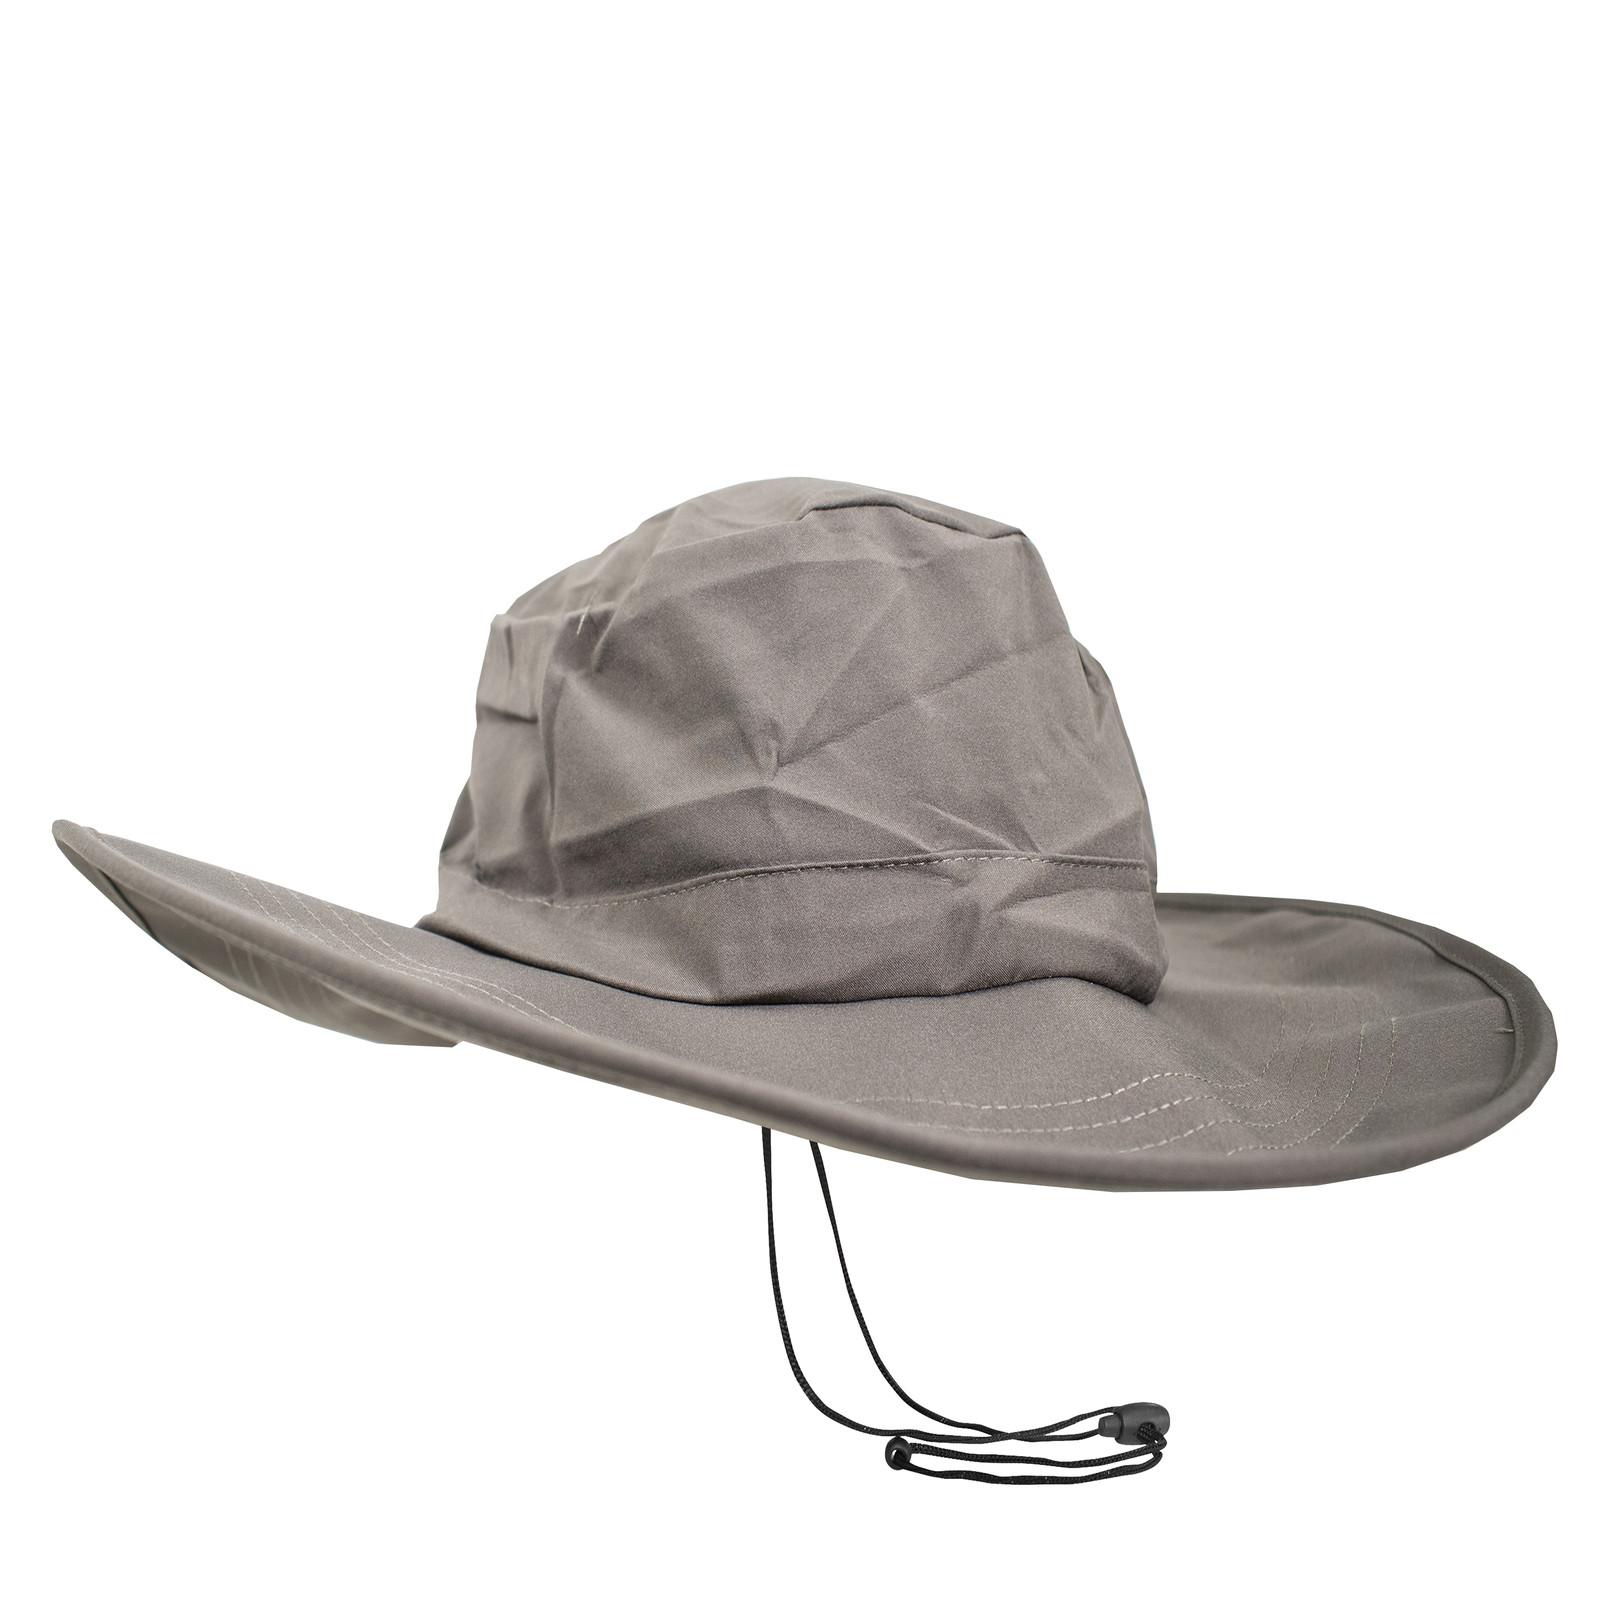 Pilot II Waterproof Boonie Hat | One Size-large